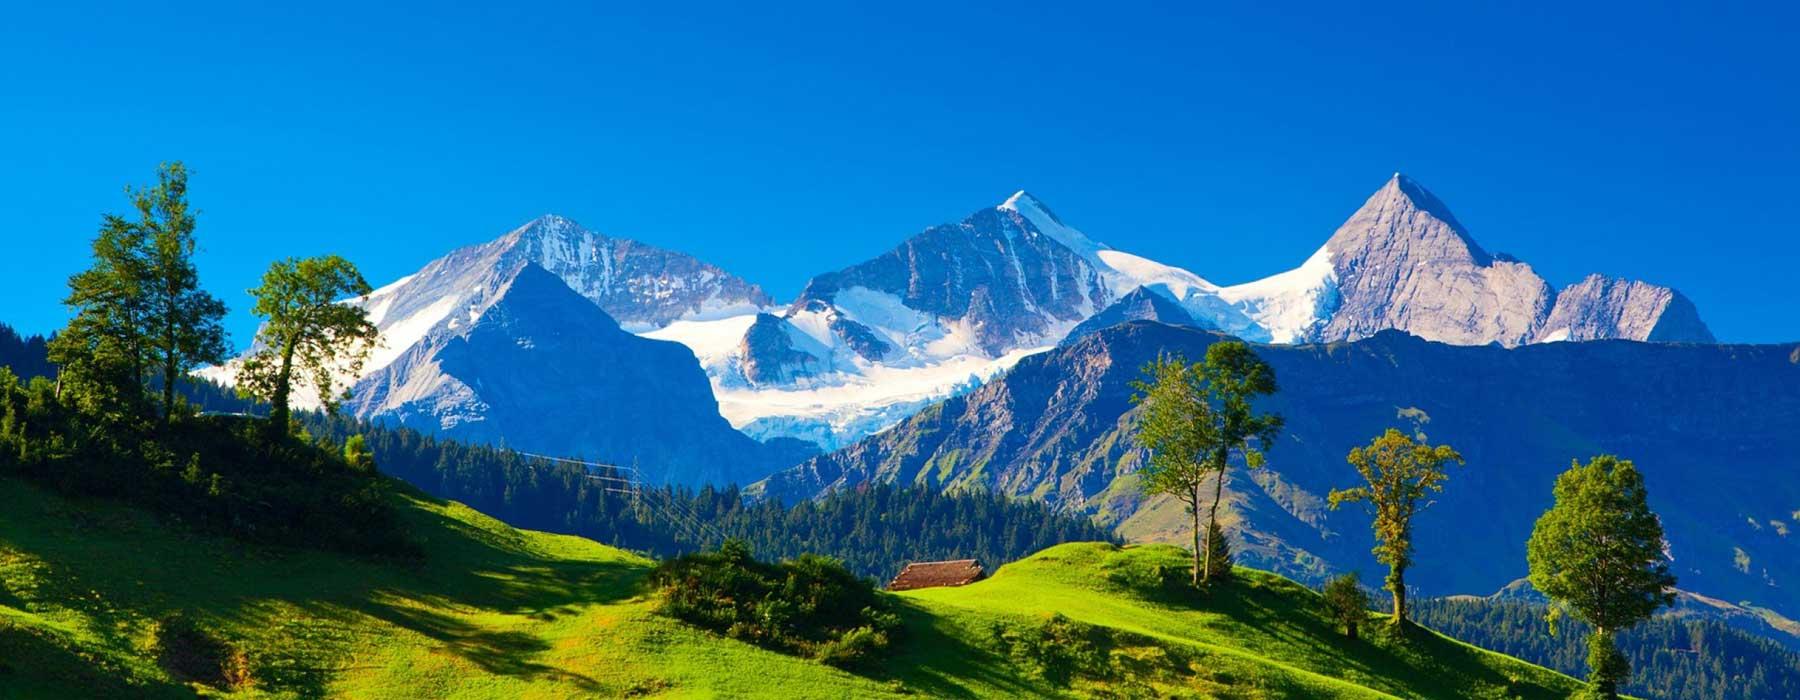 Photo 79 - Kashmir.jpg